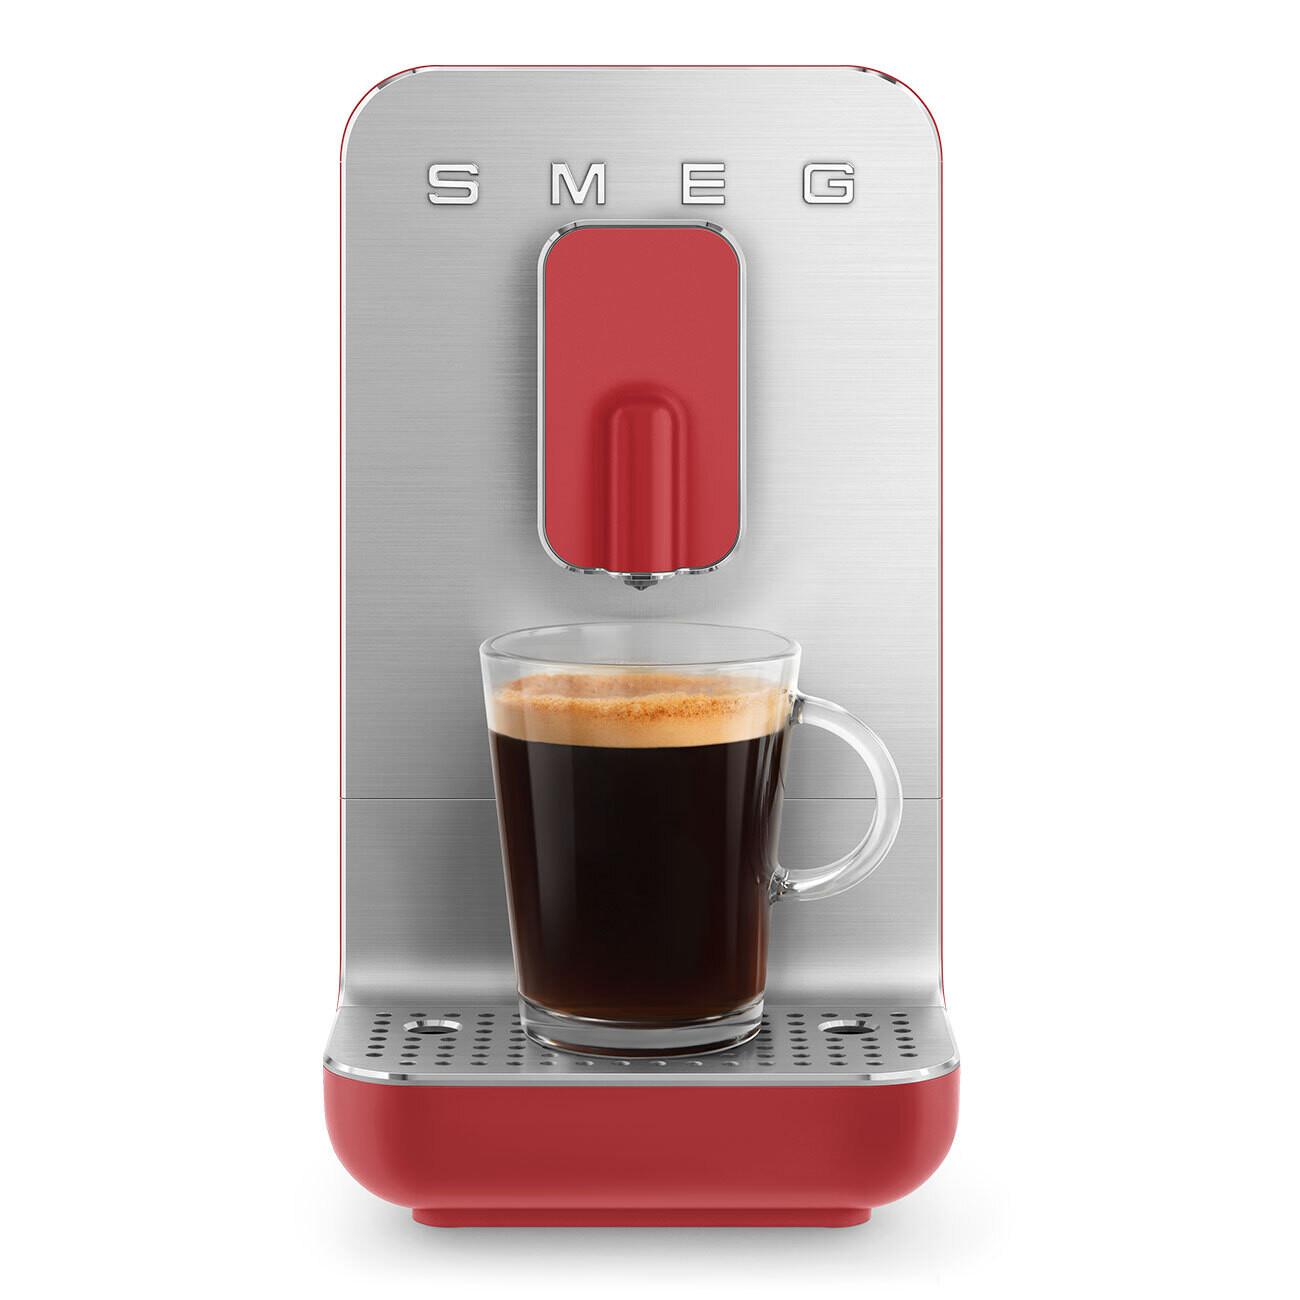 SMEG Bean to Cup automatische koffiemachine rood